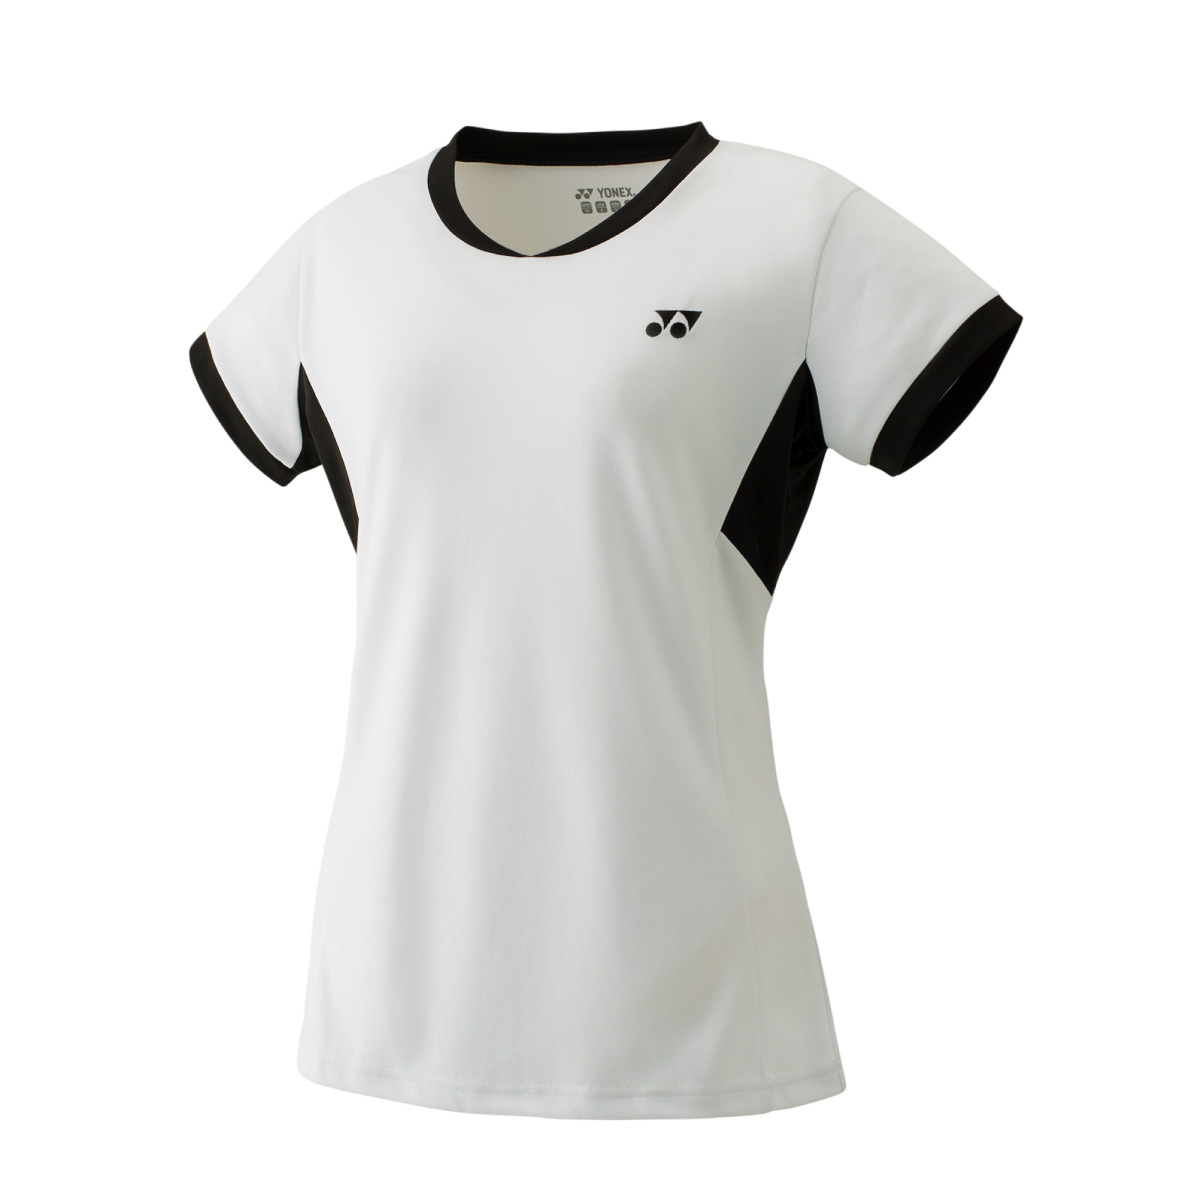 YONEX - Women Crew Neck Shirt #YW0010Detailbild - 1